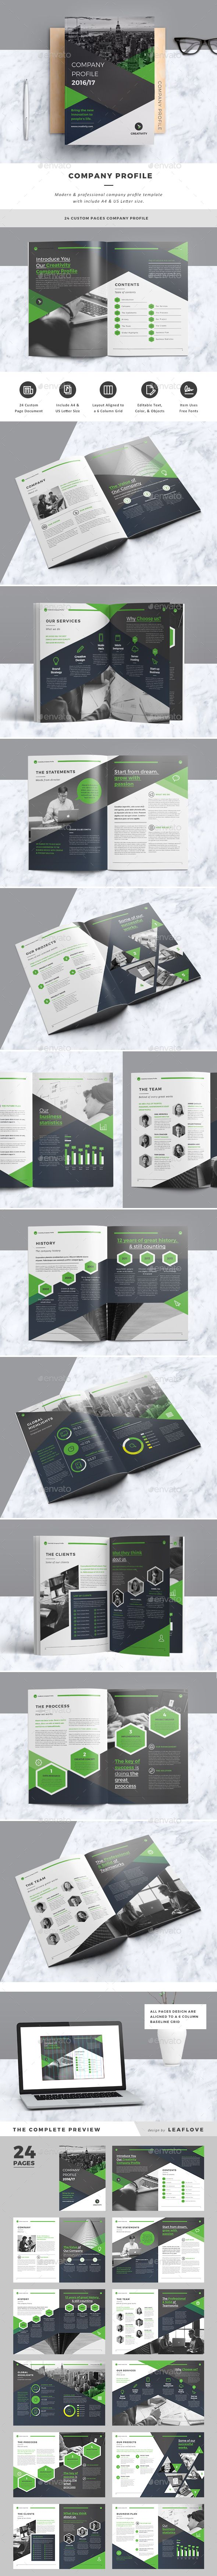 Company Profile | Company profile, Profile and Indesign templates